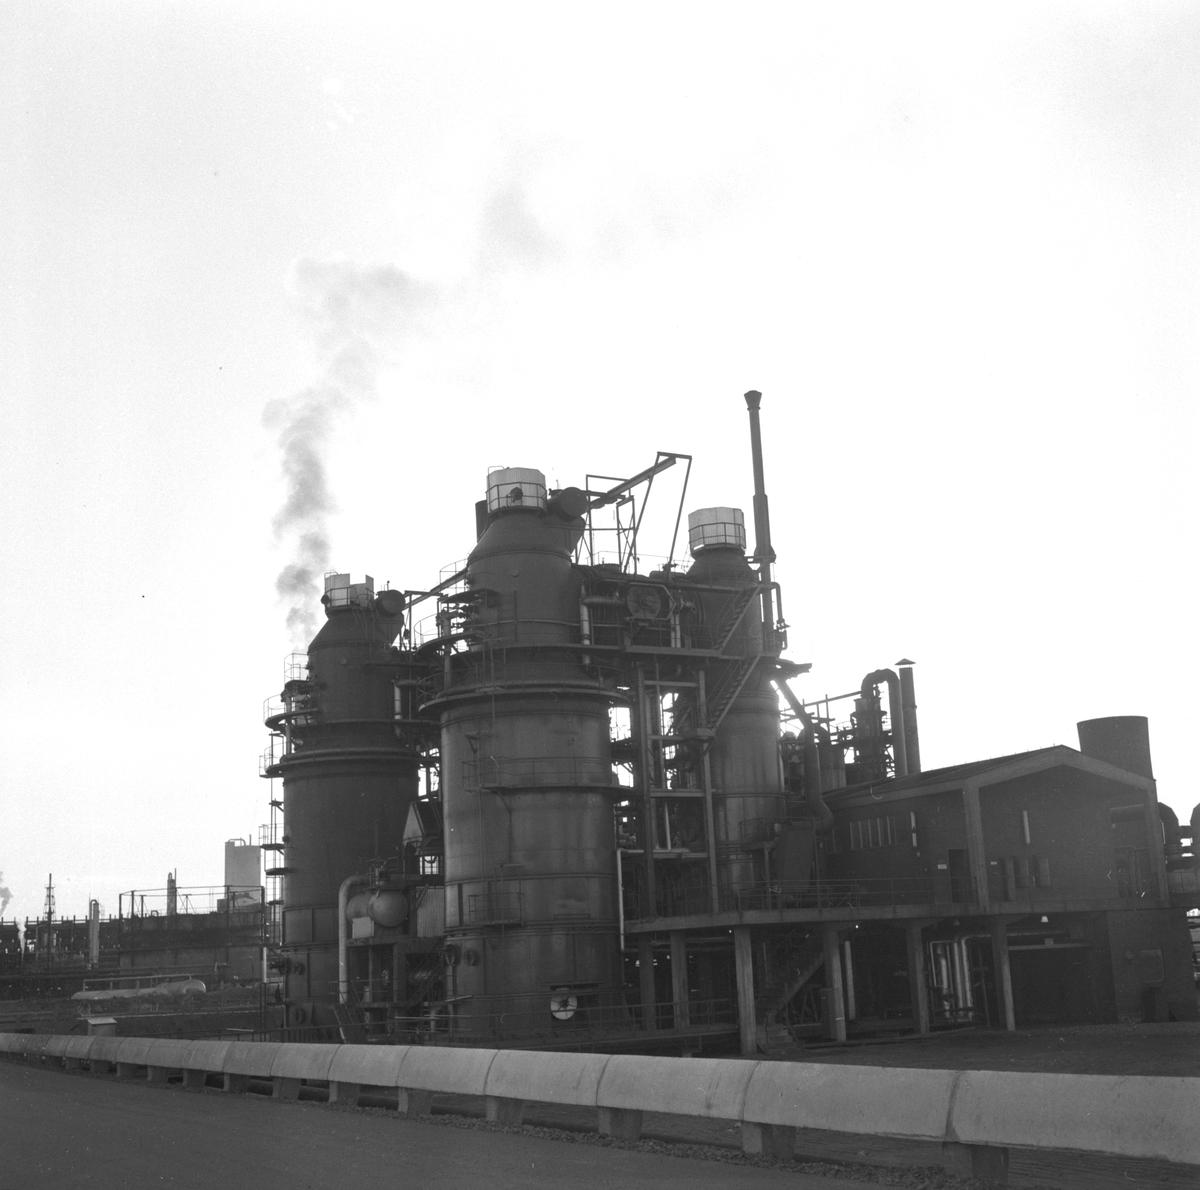 Olycka i Kvarntorp.  9 maj 1959.